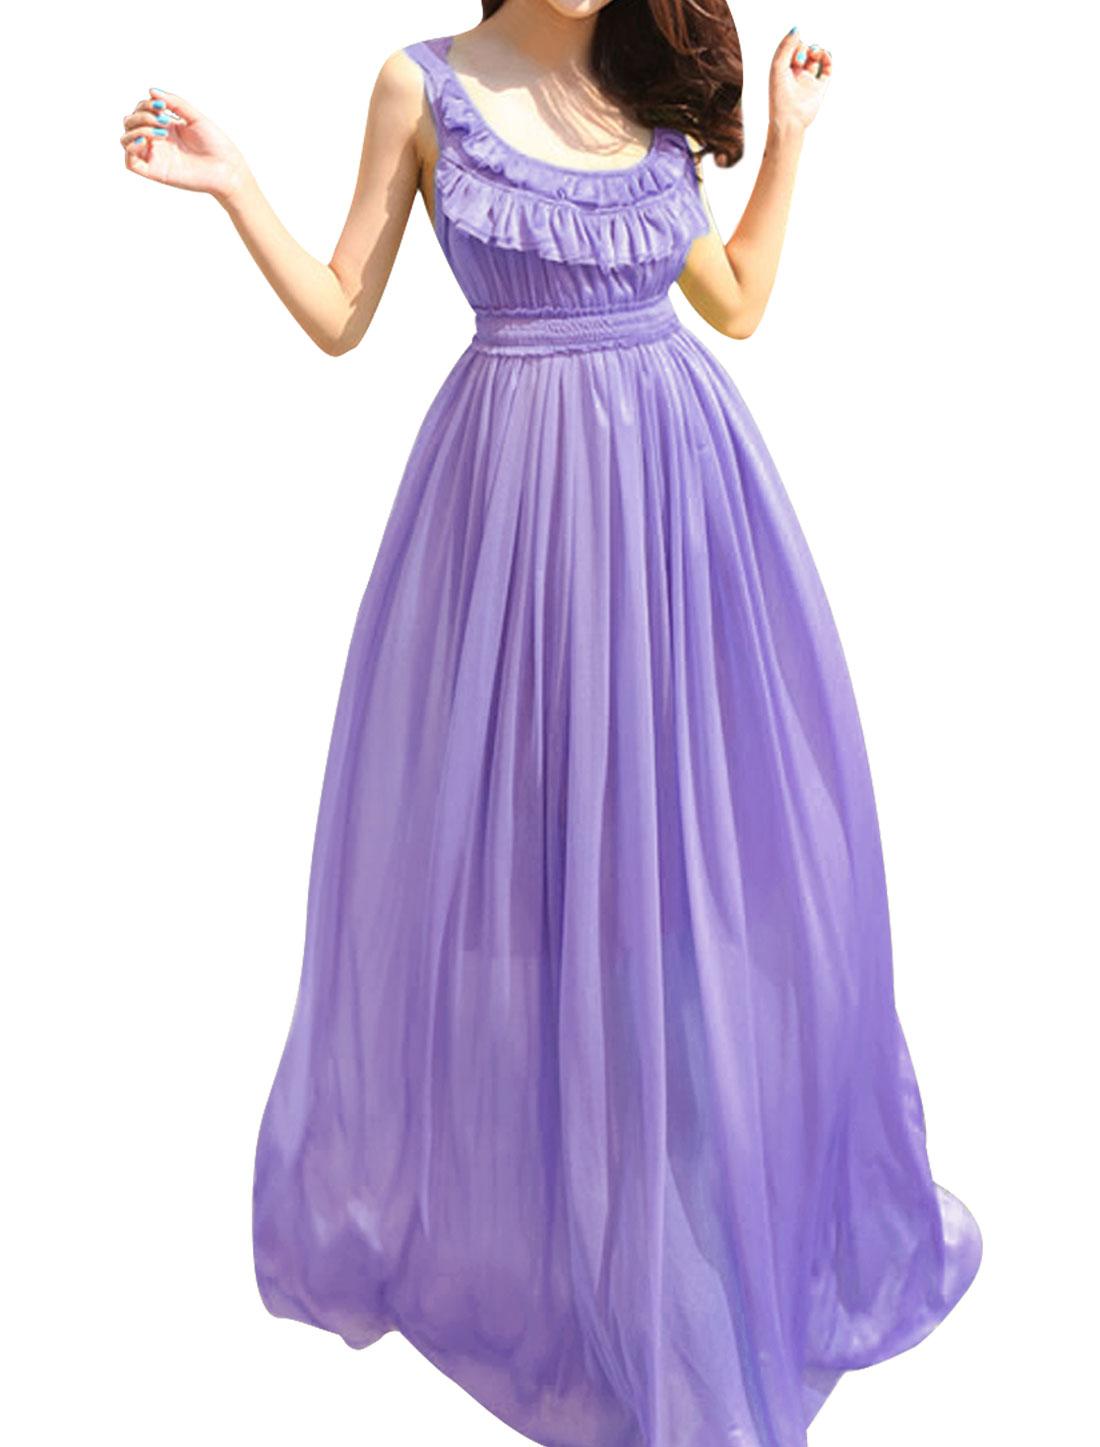 Ladies Light Purple Sleeveless Flouncing Detail Semi Sheer Maxi Dress XS